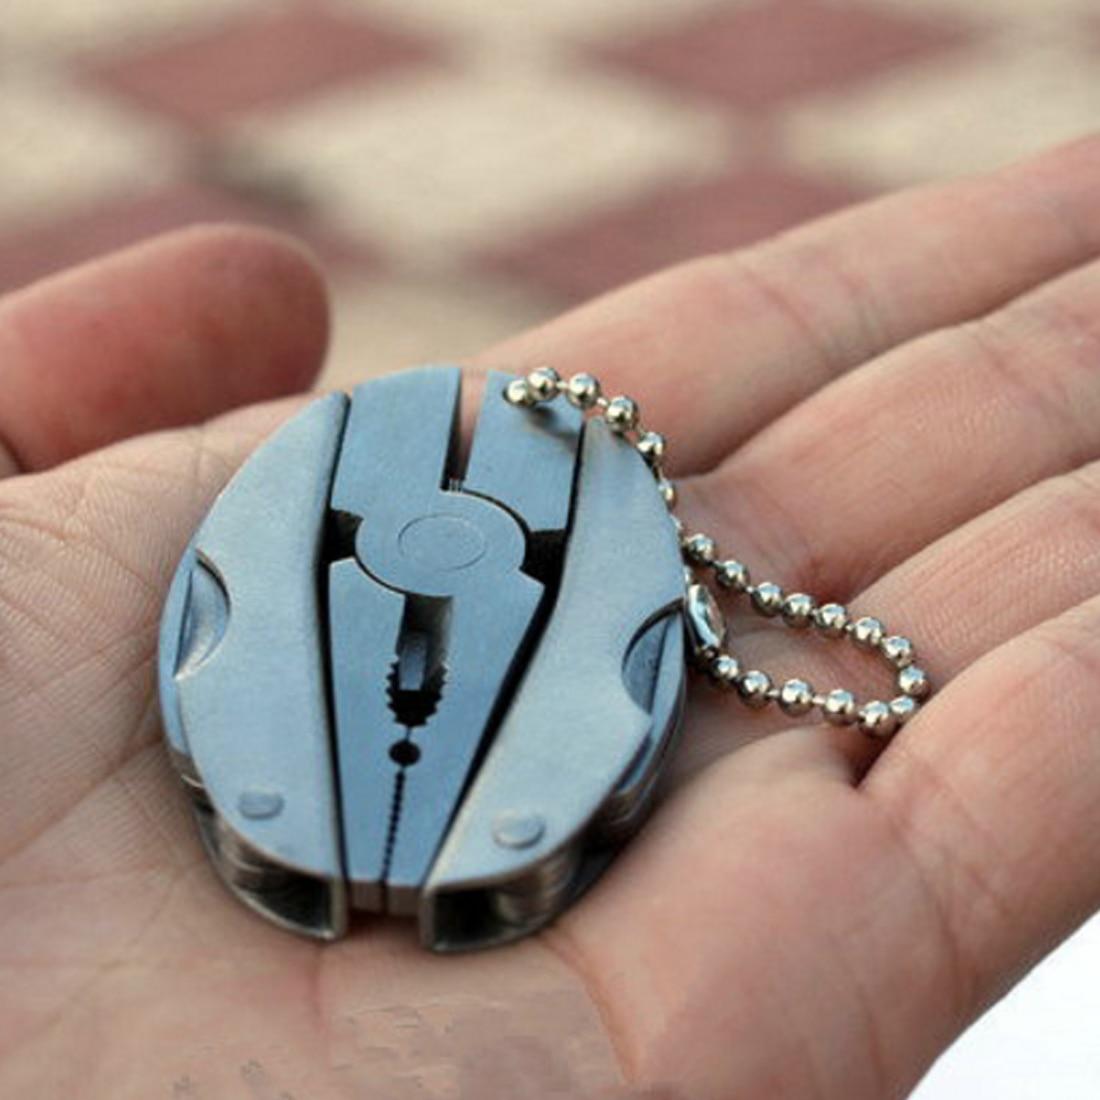 Werkzeuge Neue 1 Pc Outdoor Mini Folding Muilti Funktions Zange Clamp Folding Multi-clamp Keychain Outdoor Wandern Werkzeug Tasche Multitools Hochwertige Materialien